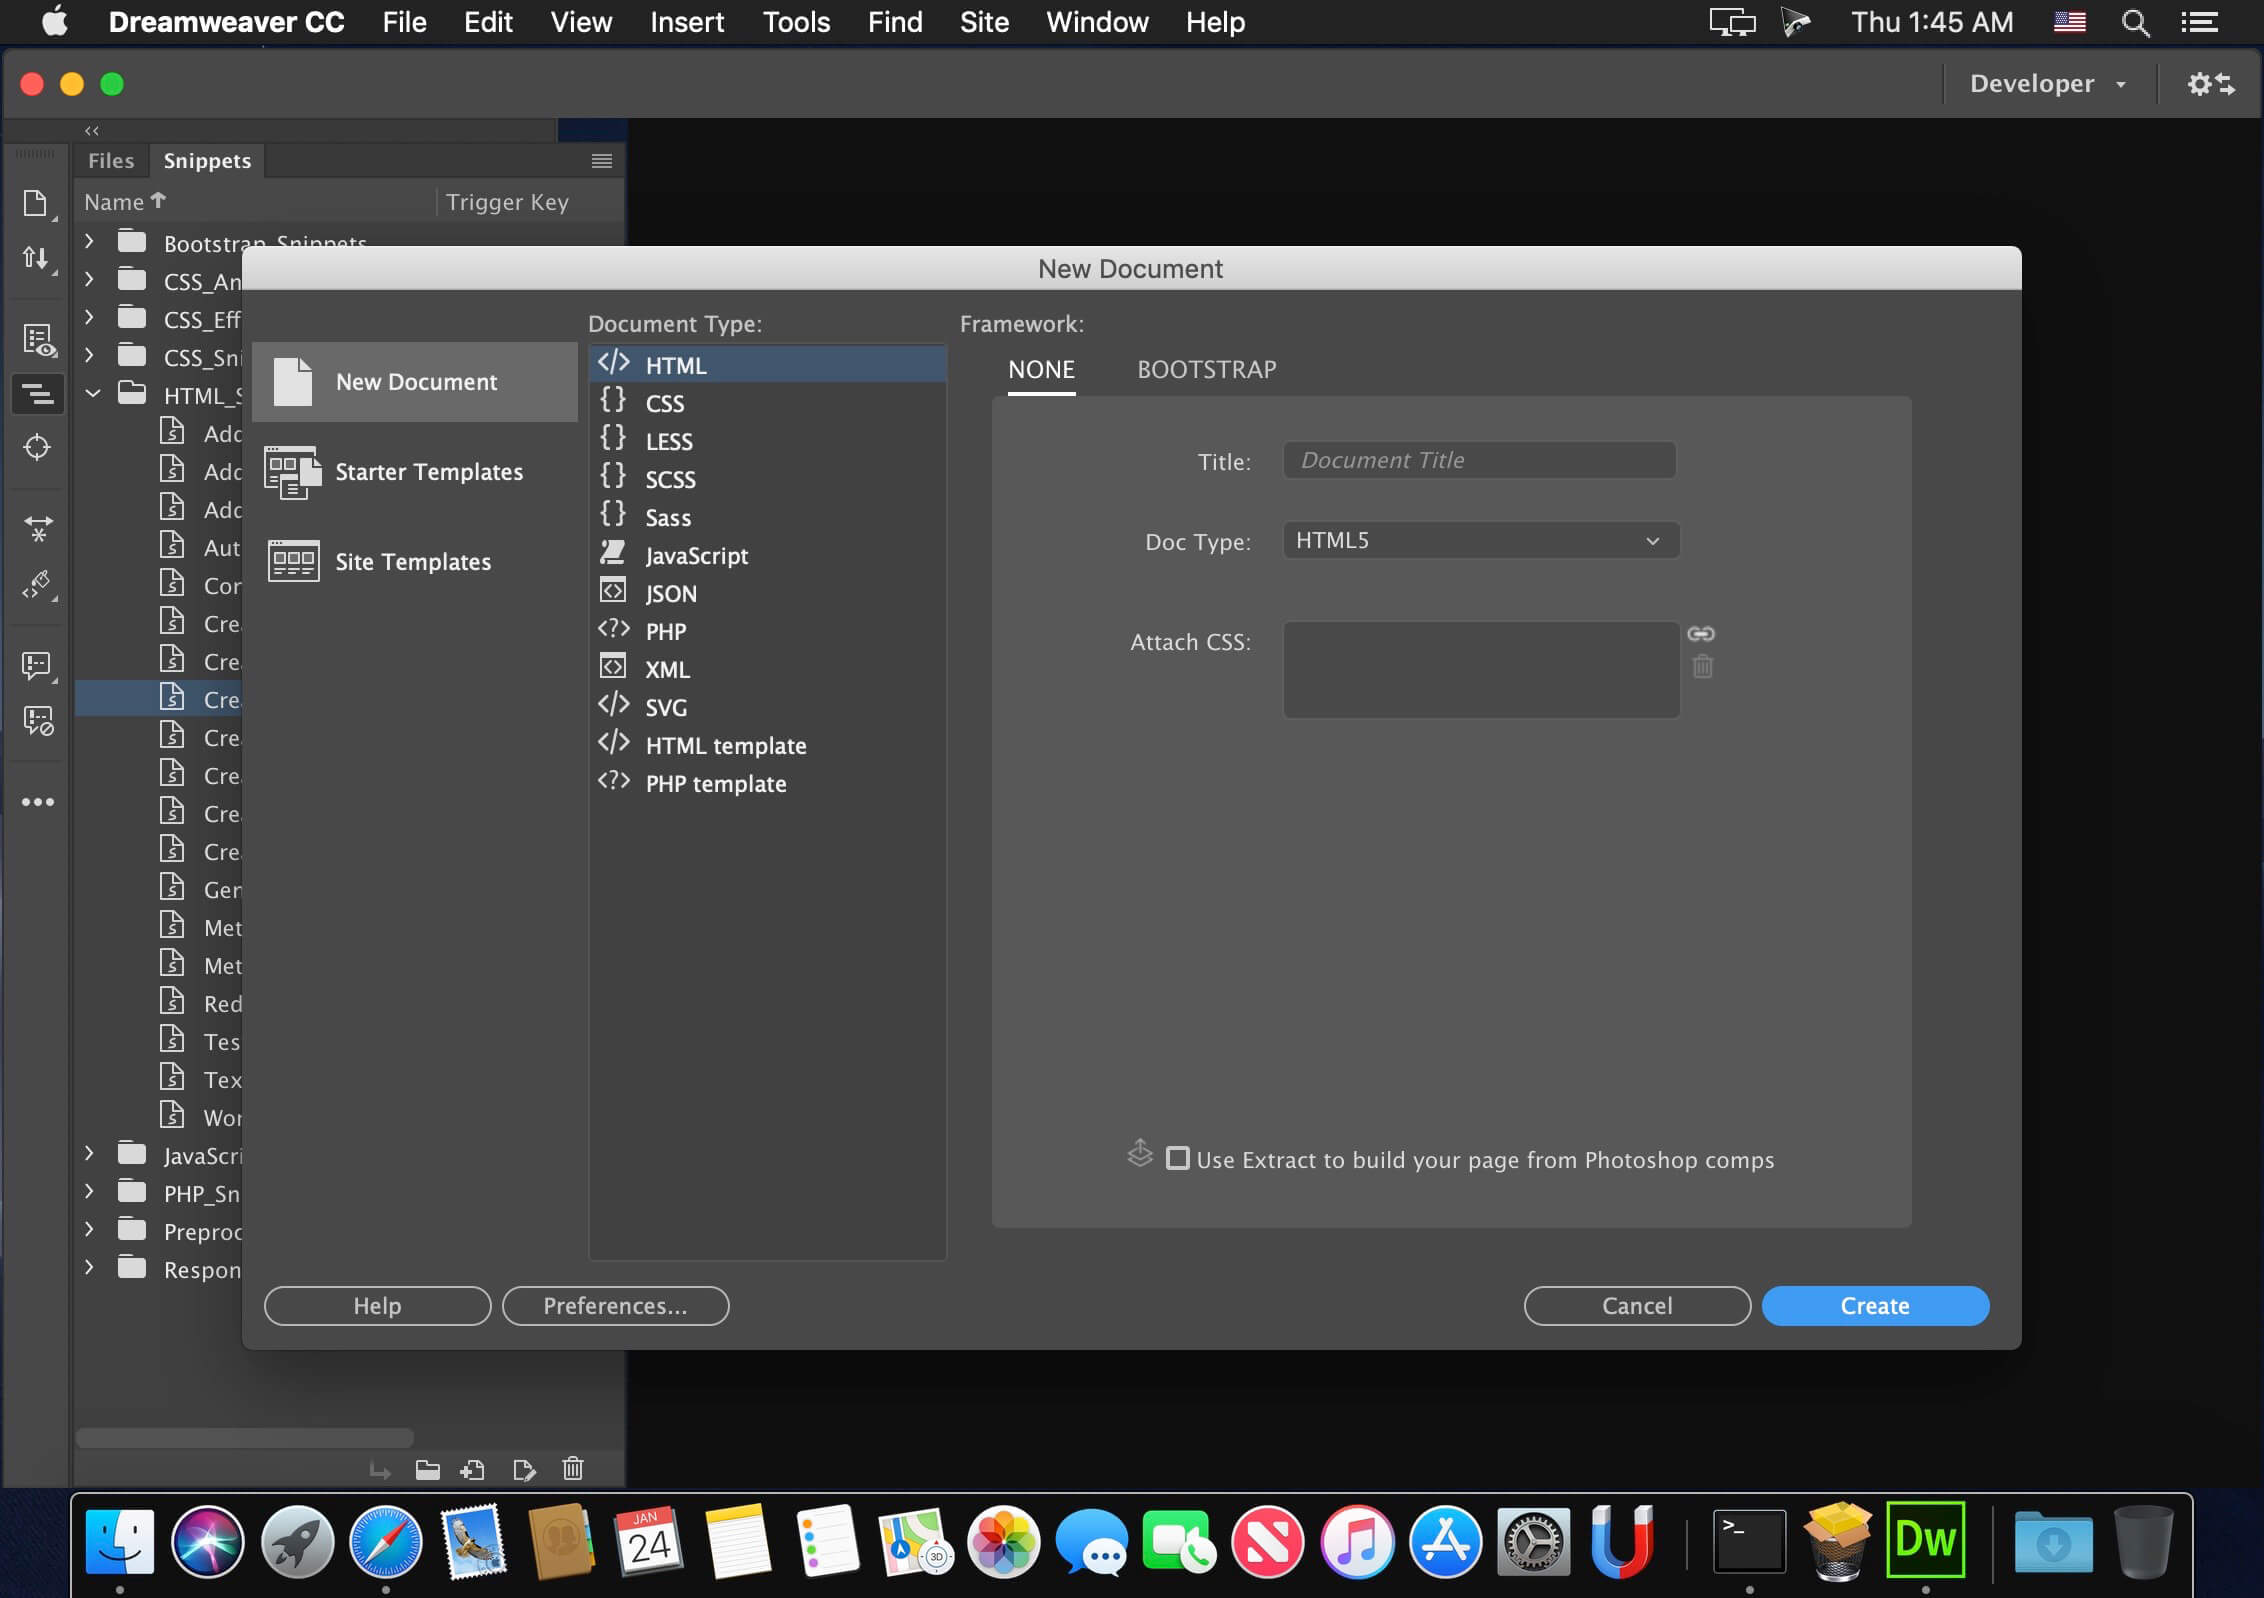 adobe dreamweaver free download full version for windows 7 64 bit